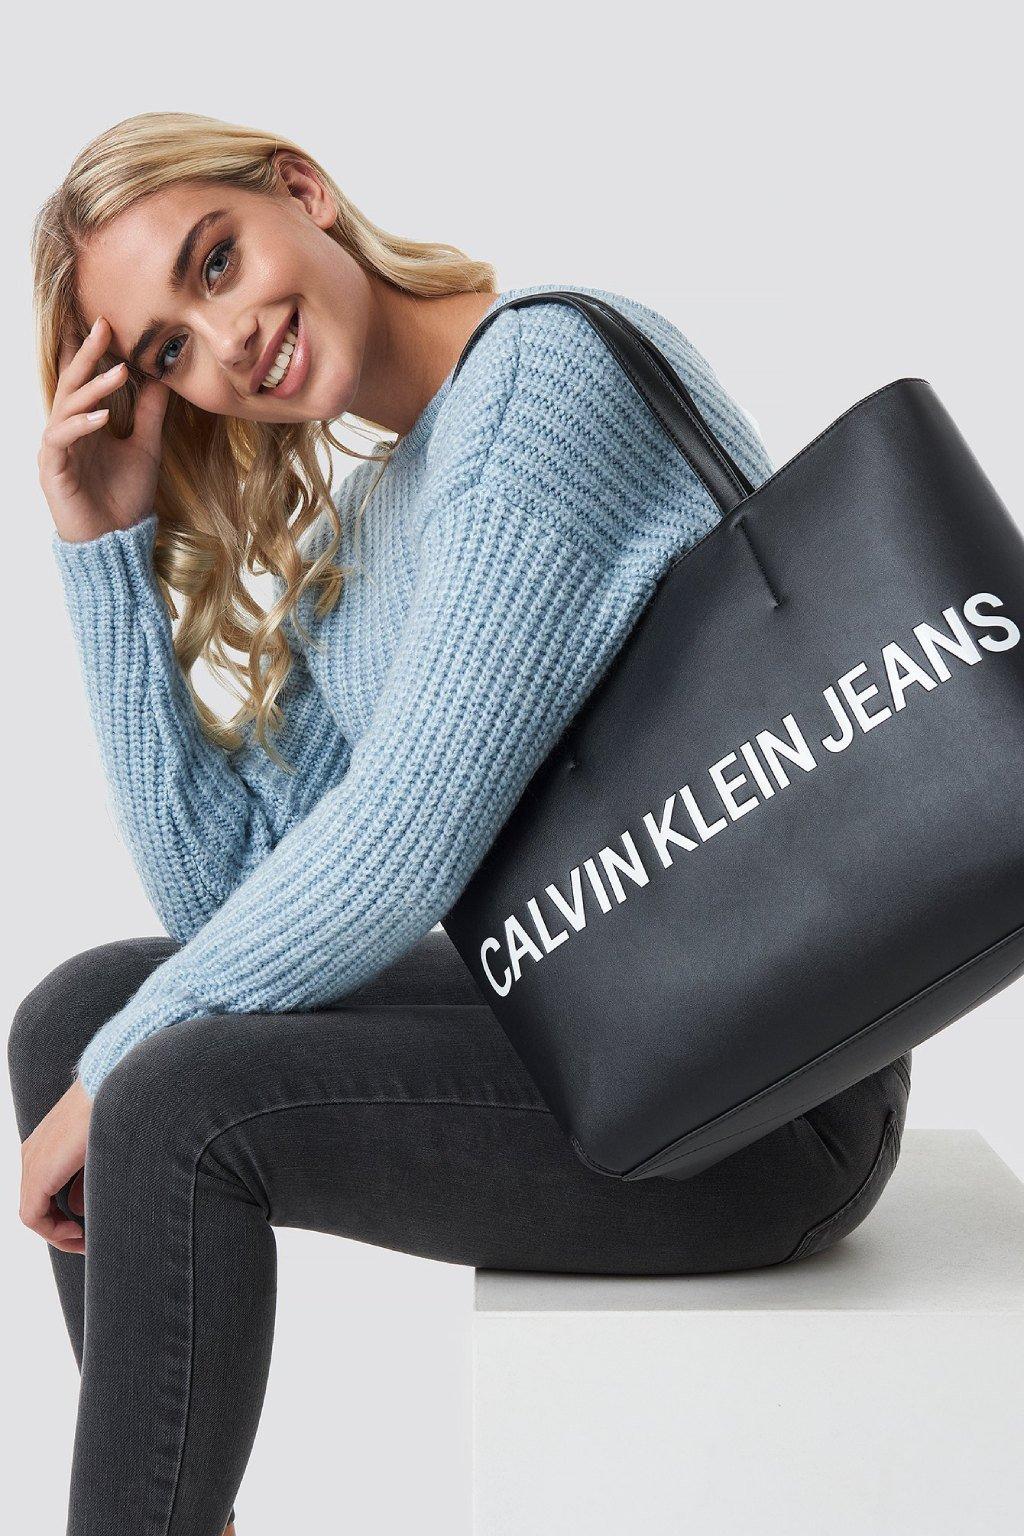 Kabelka Calvin Klein Cerna A4 tote shoper shopperka CKJ pres rameno znackova kabelka CK (1)